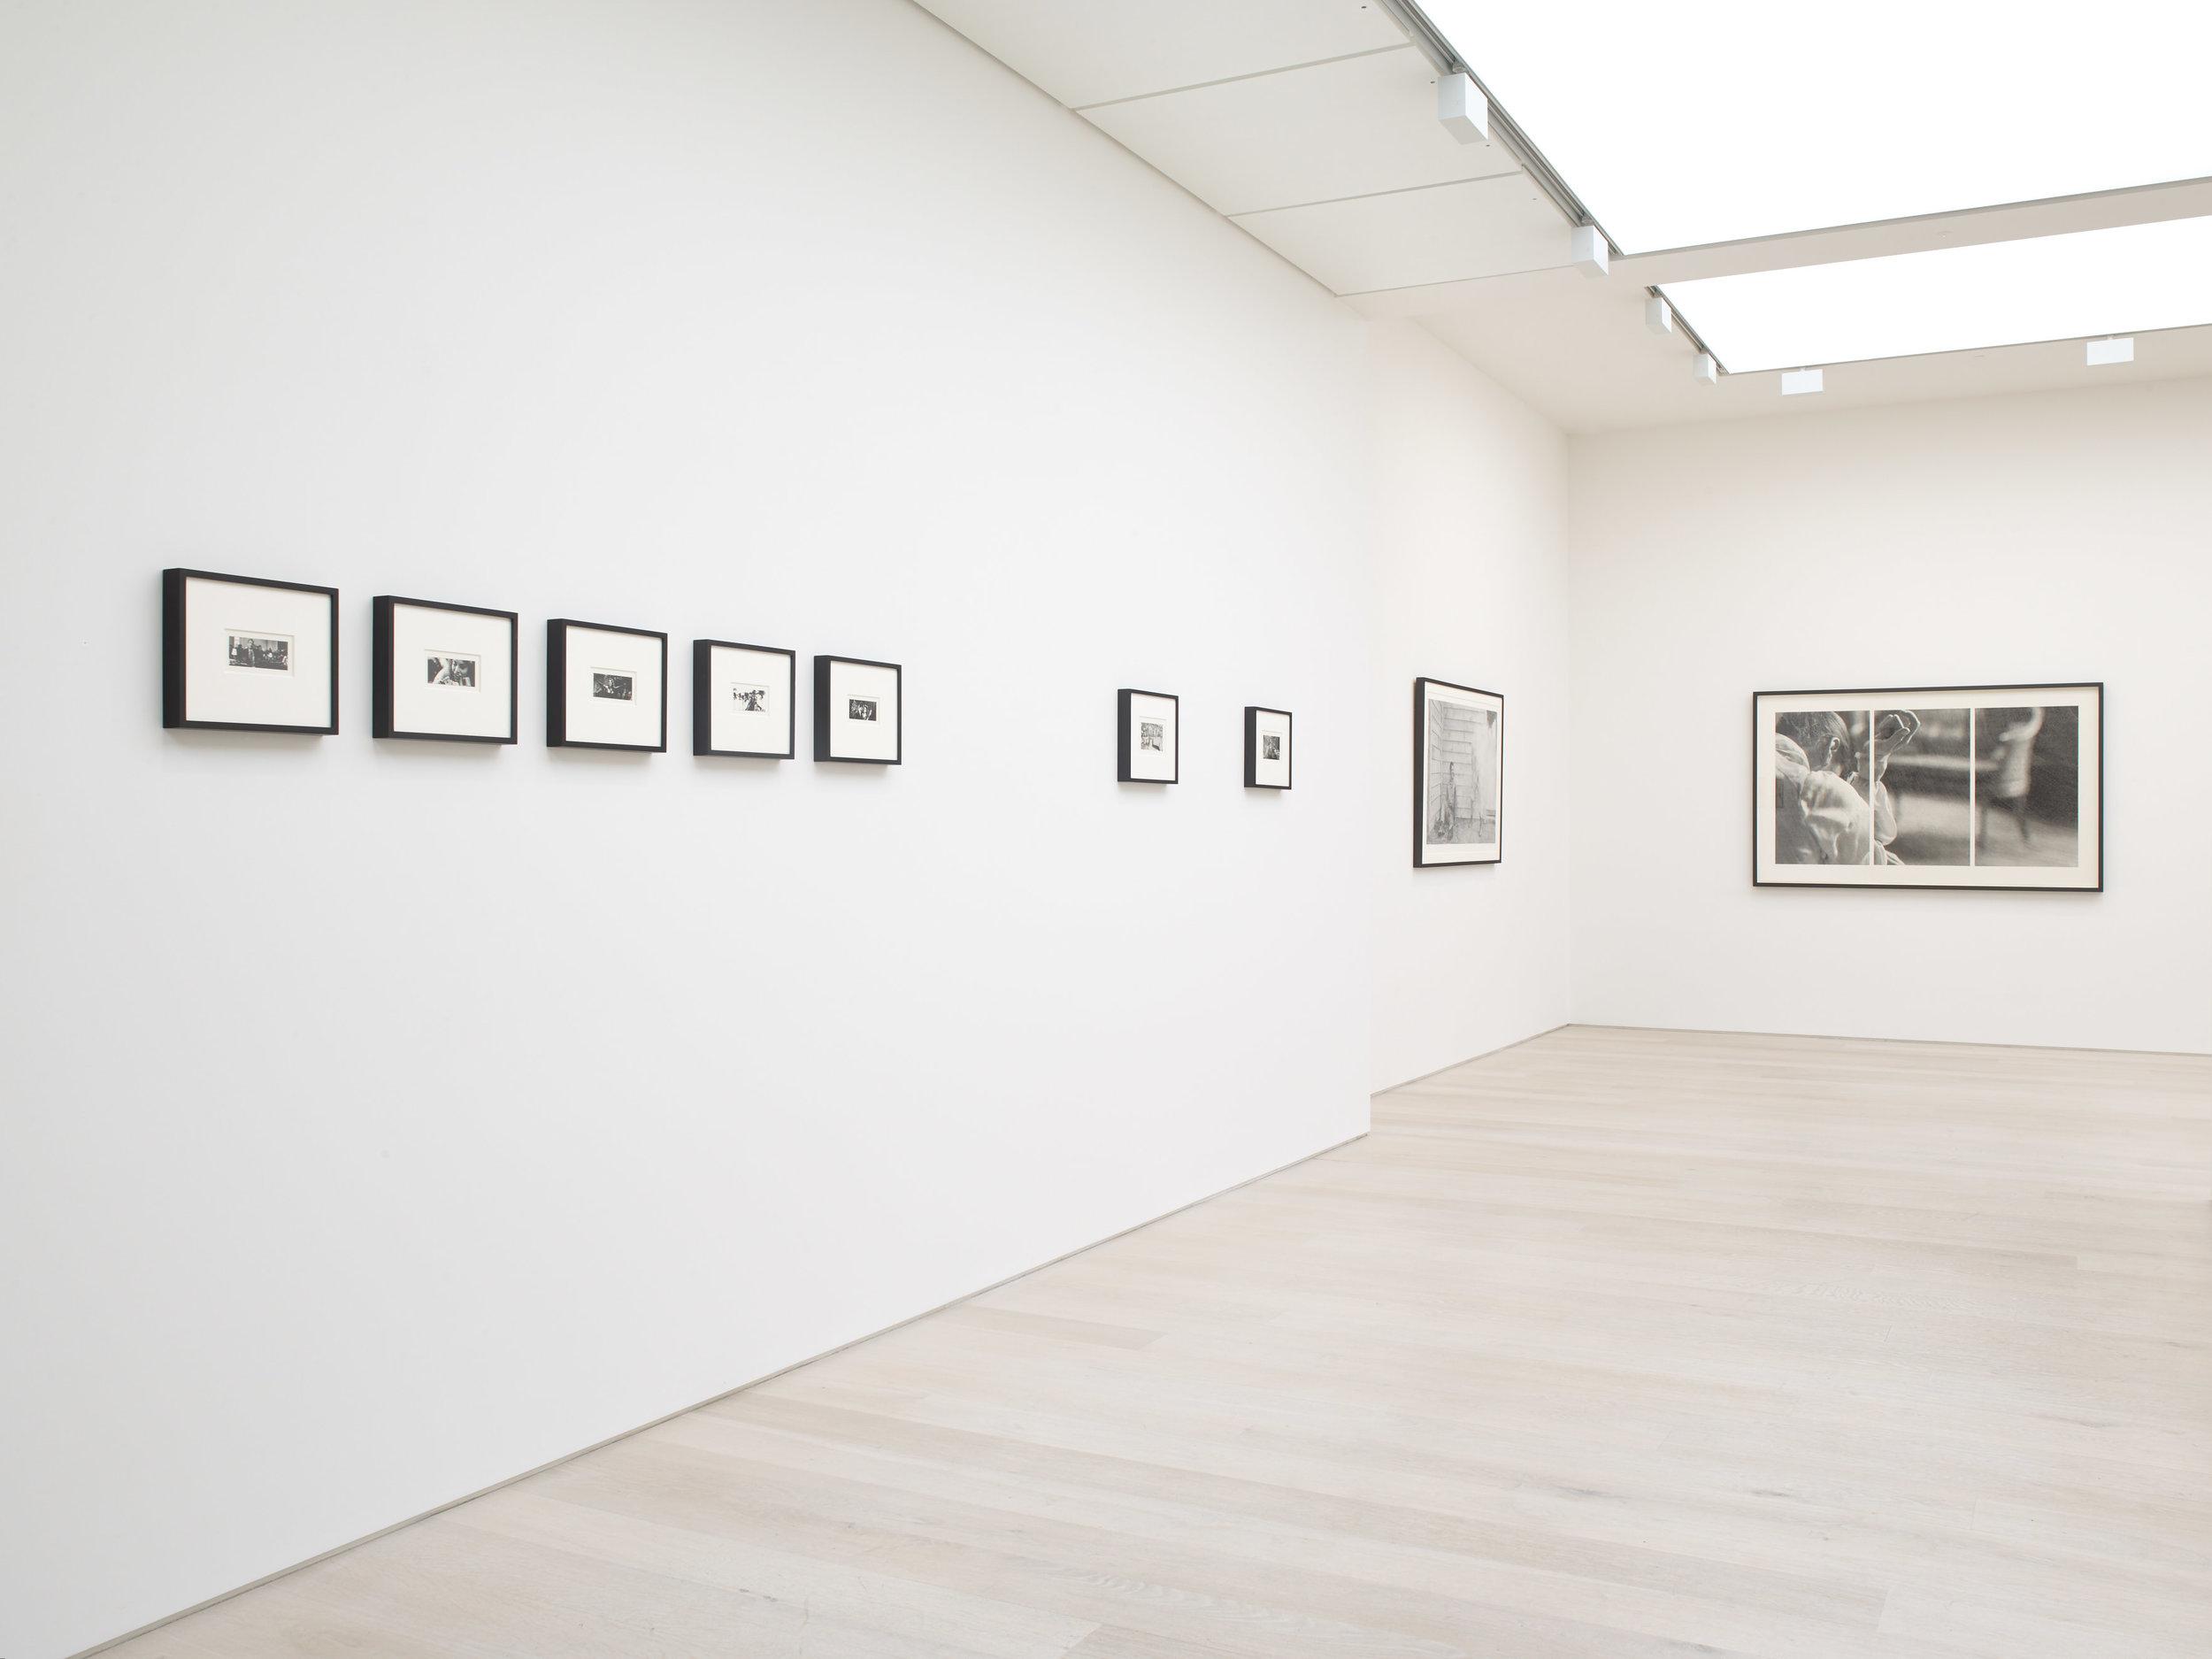 Marie Harnett_Still_Alan Cristea Gallery 2017 installation. Photo Stephe...-1.jpg